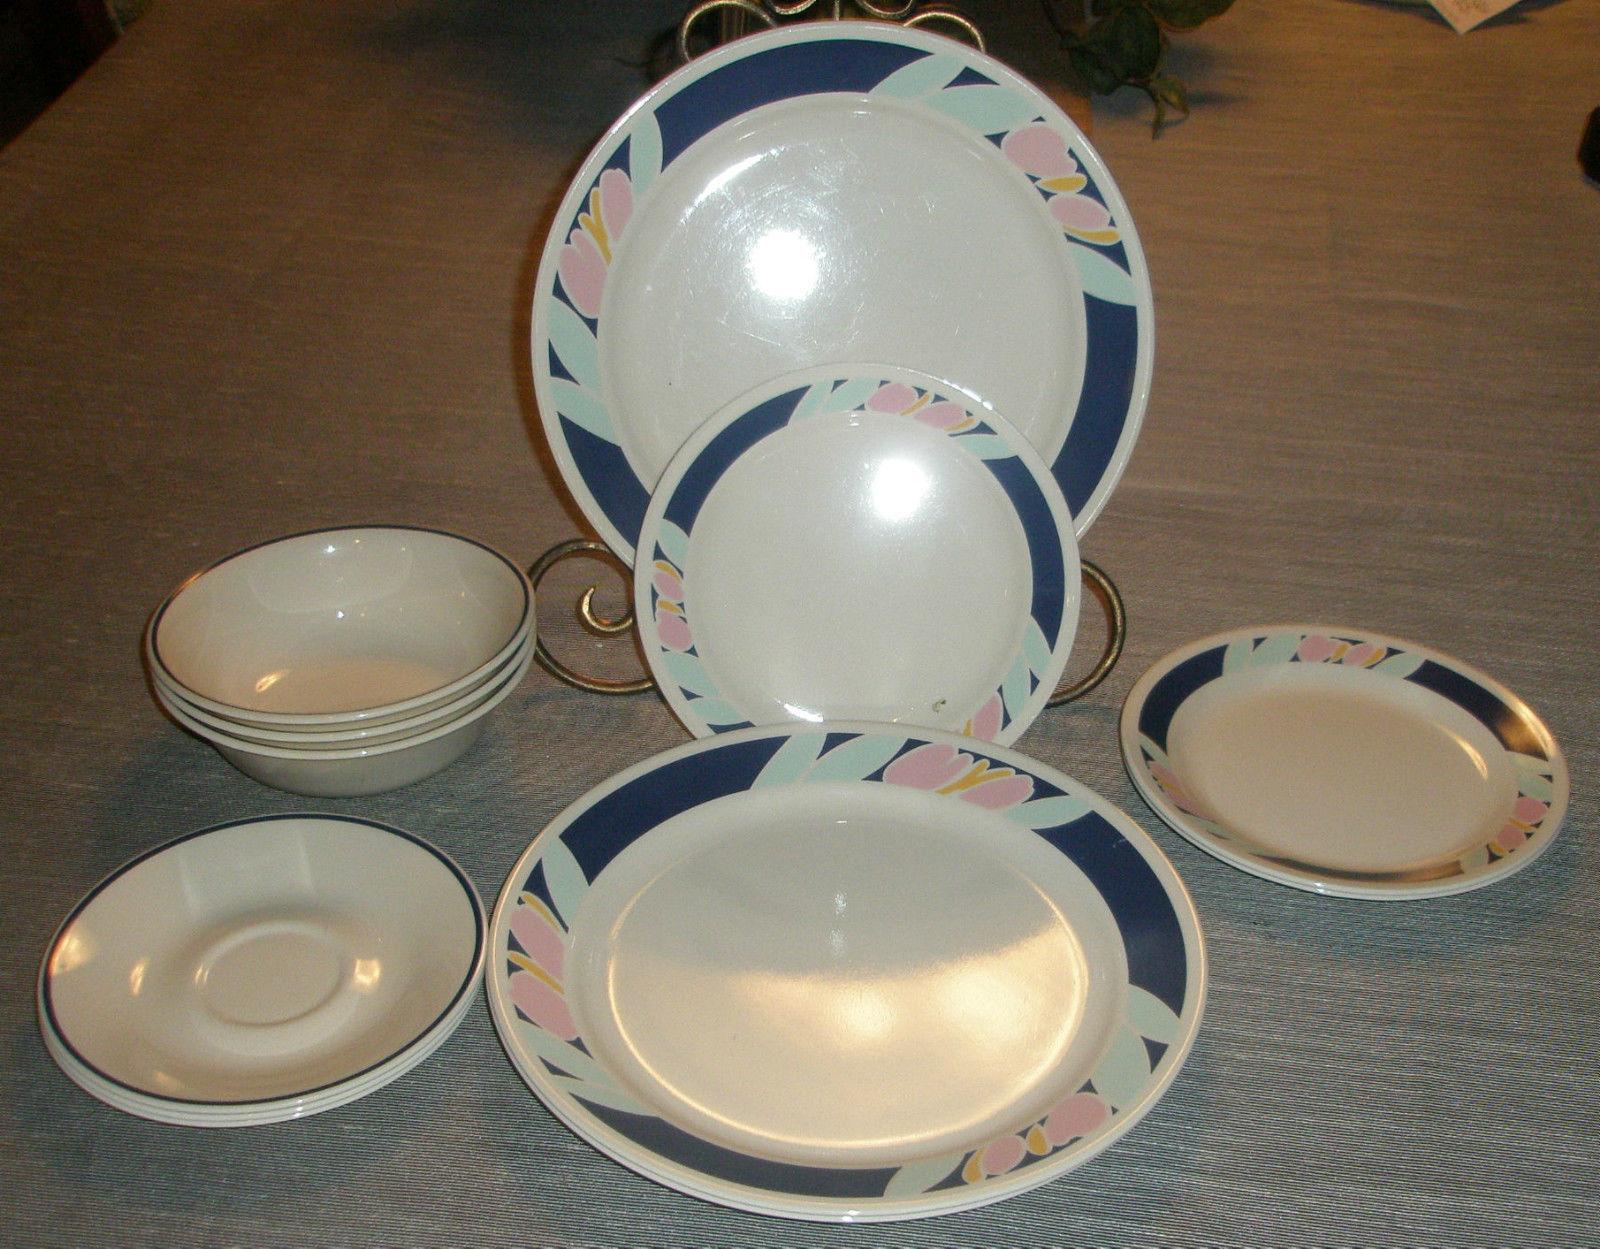 12pcs Corelle TULIP ACCENTS Dinnerware Plates u0026 Bowls & 12pcs Corelle Tulip Accents Dinnerware and 12 similar items